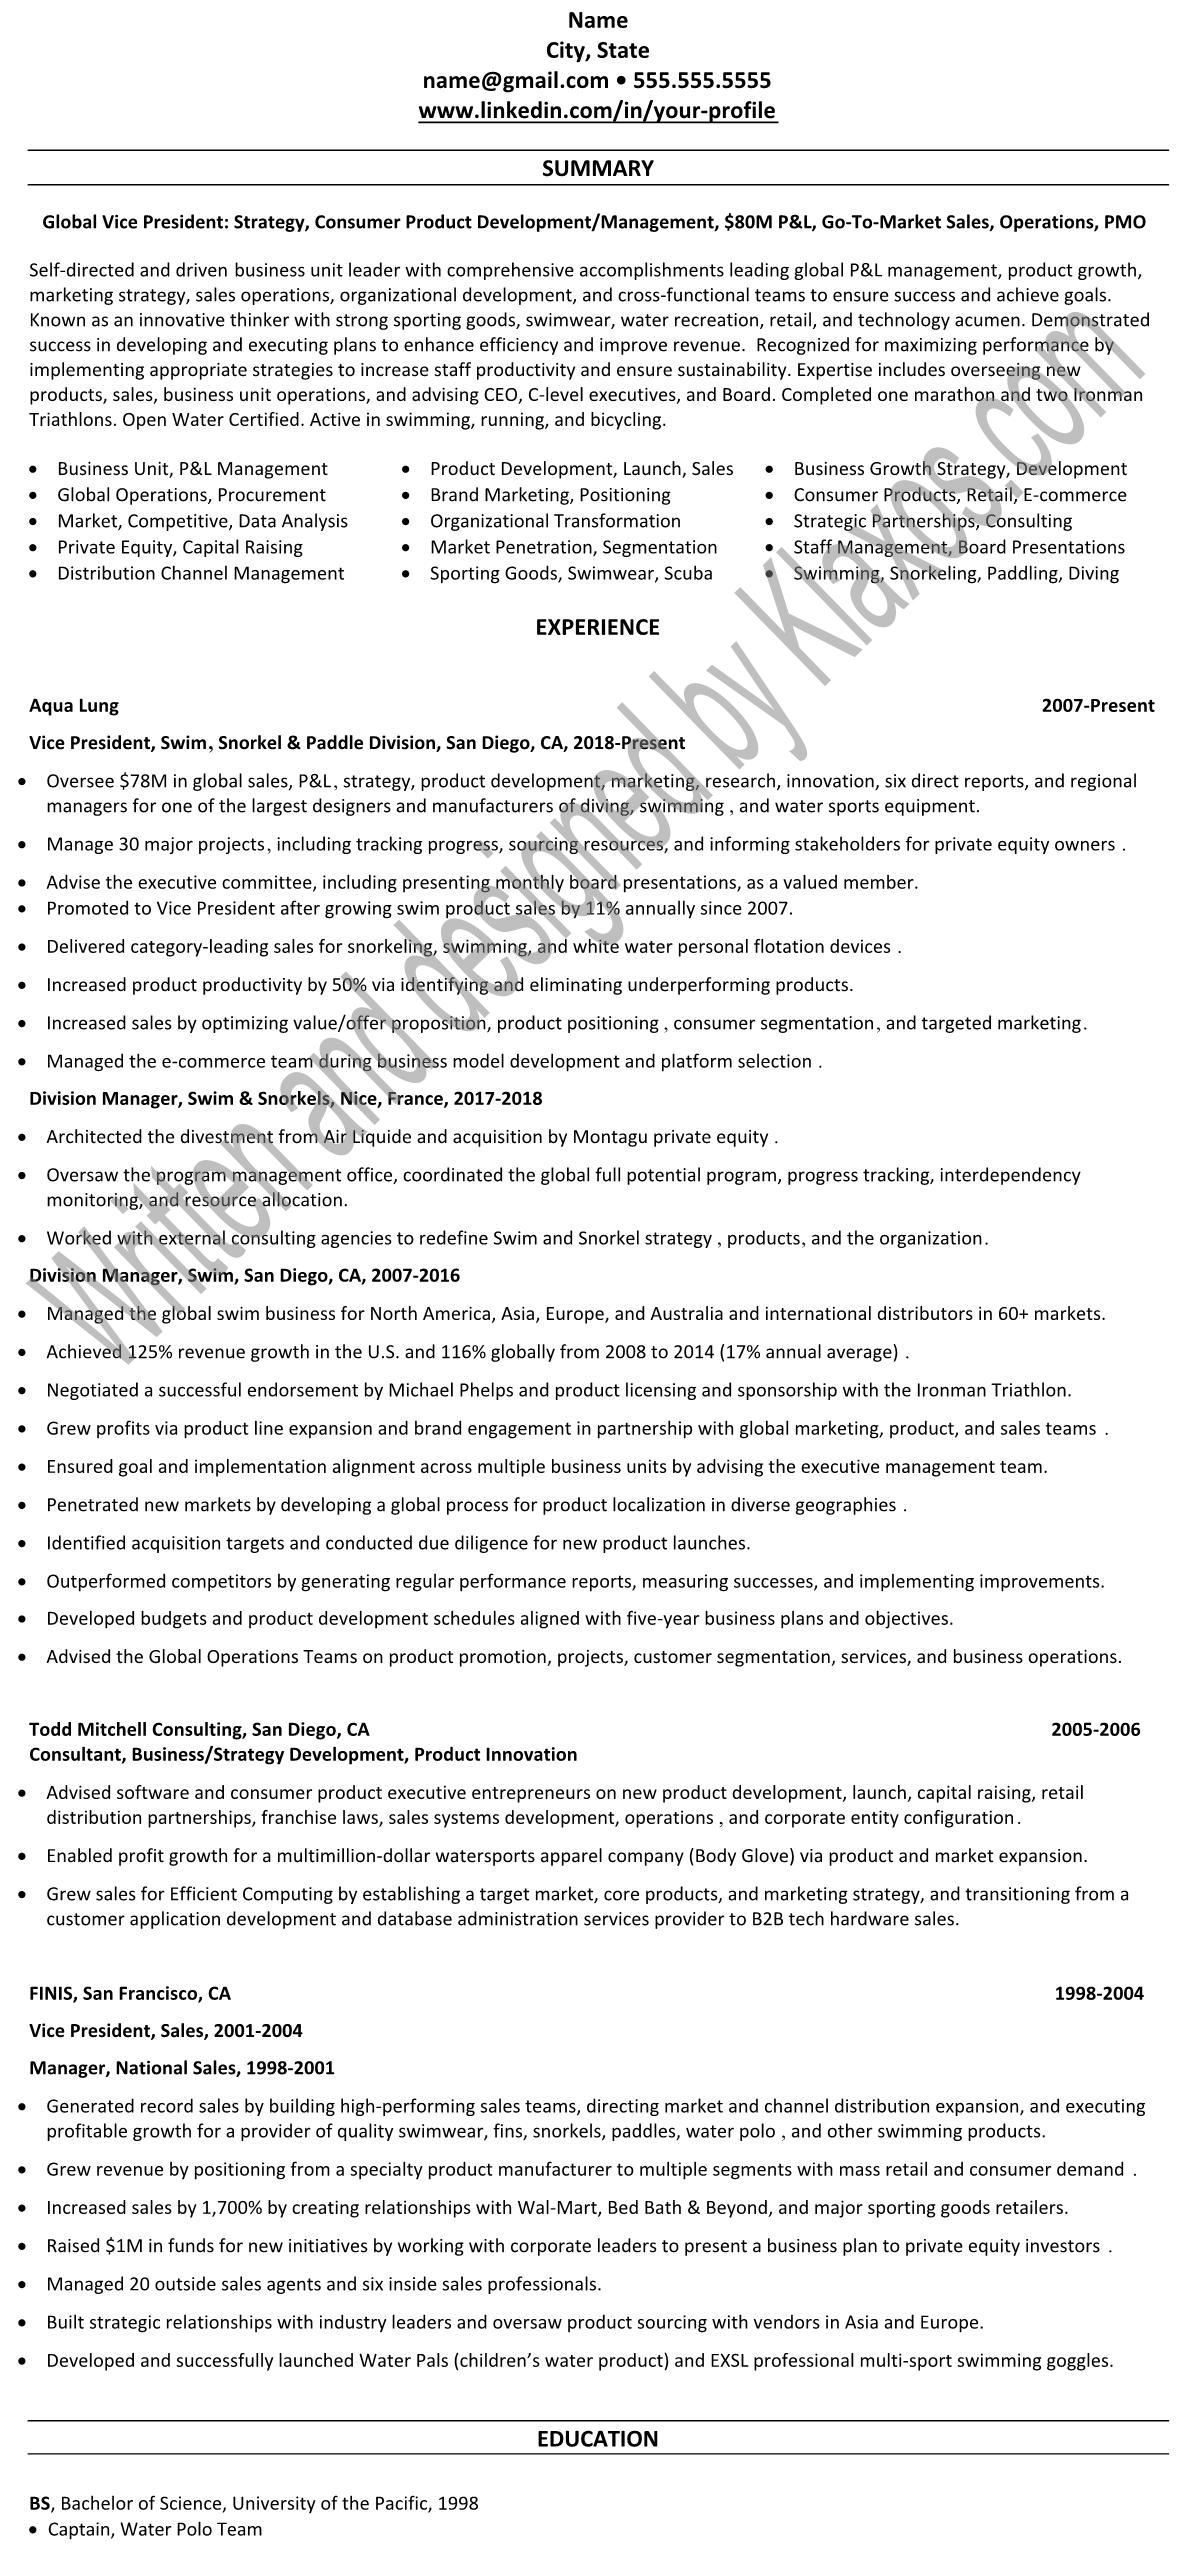 Resume 2817